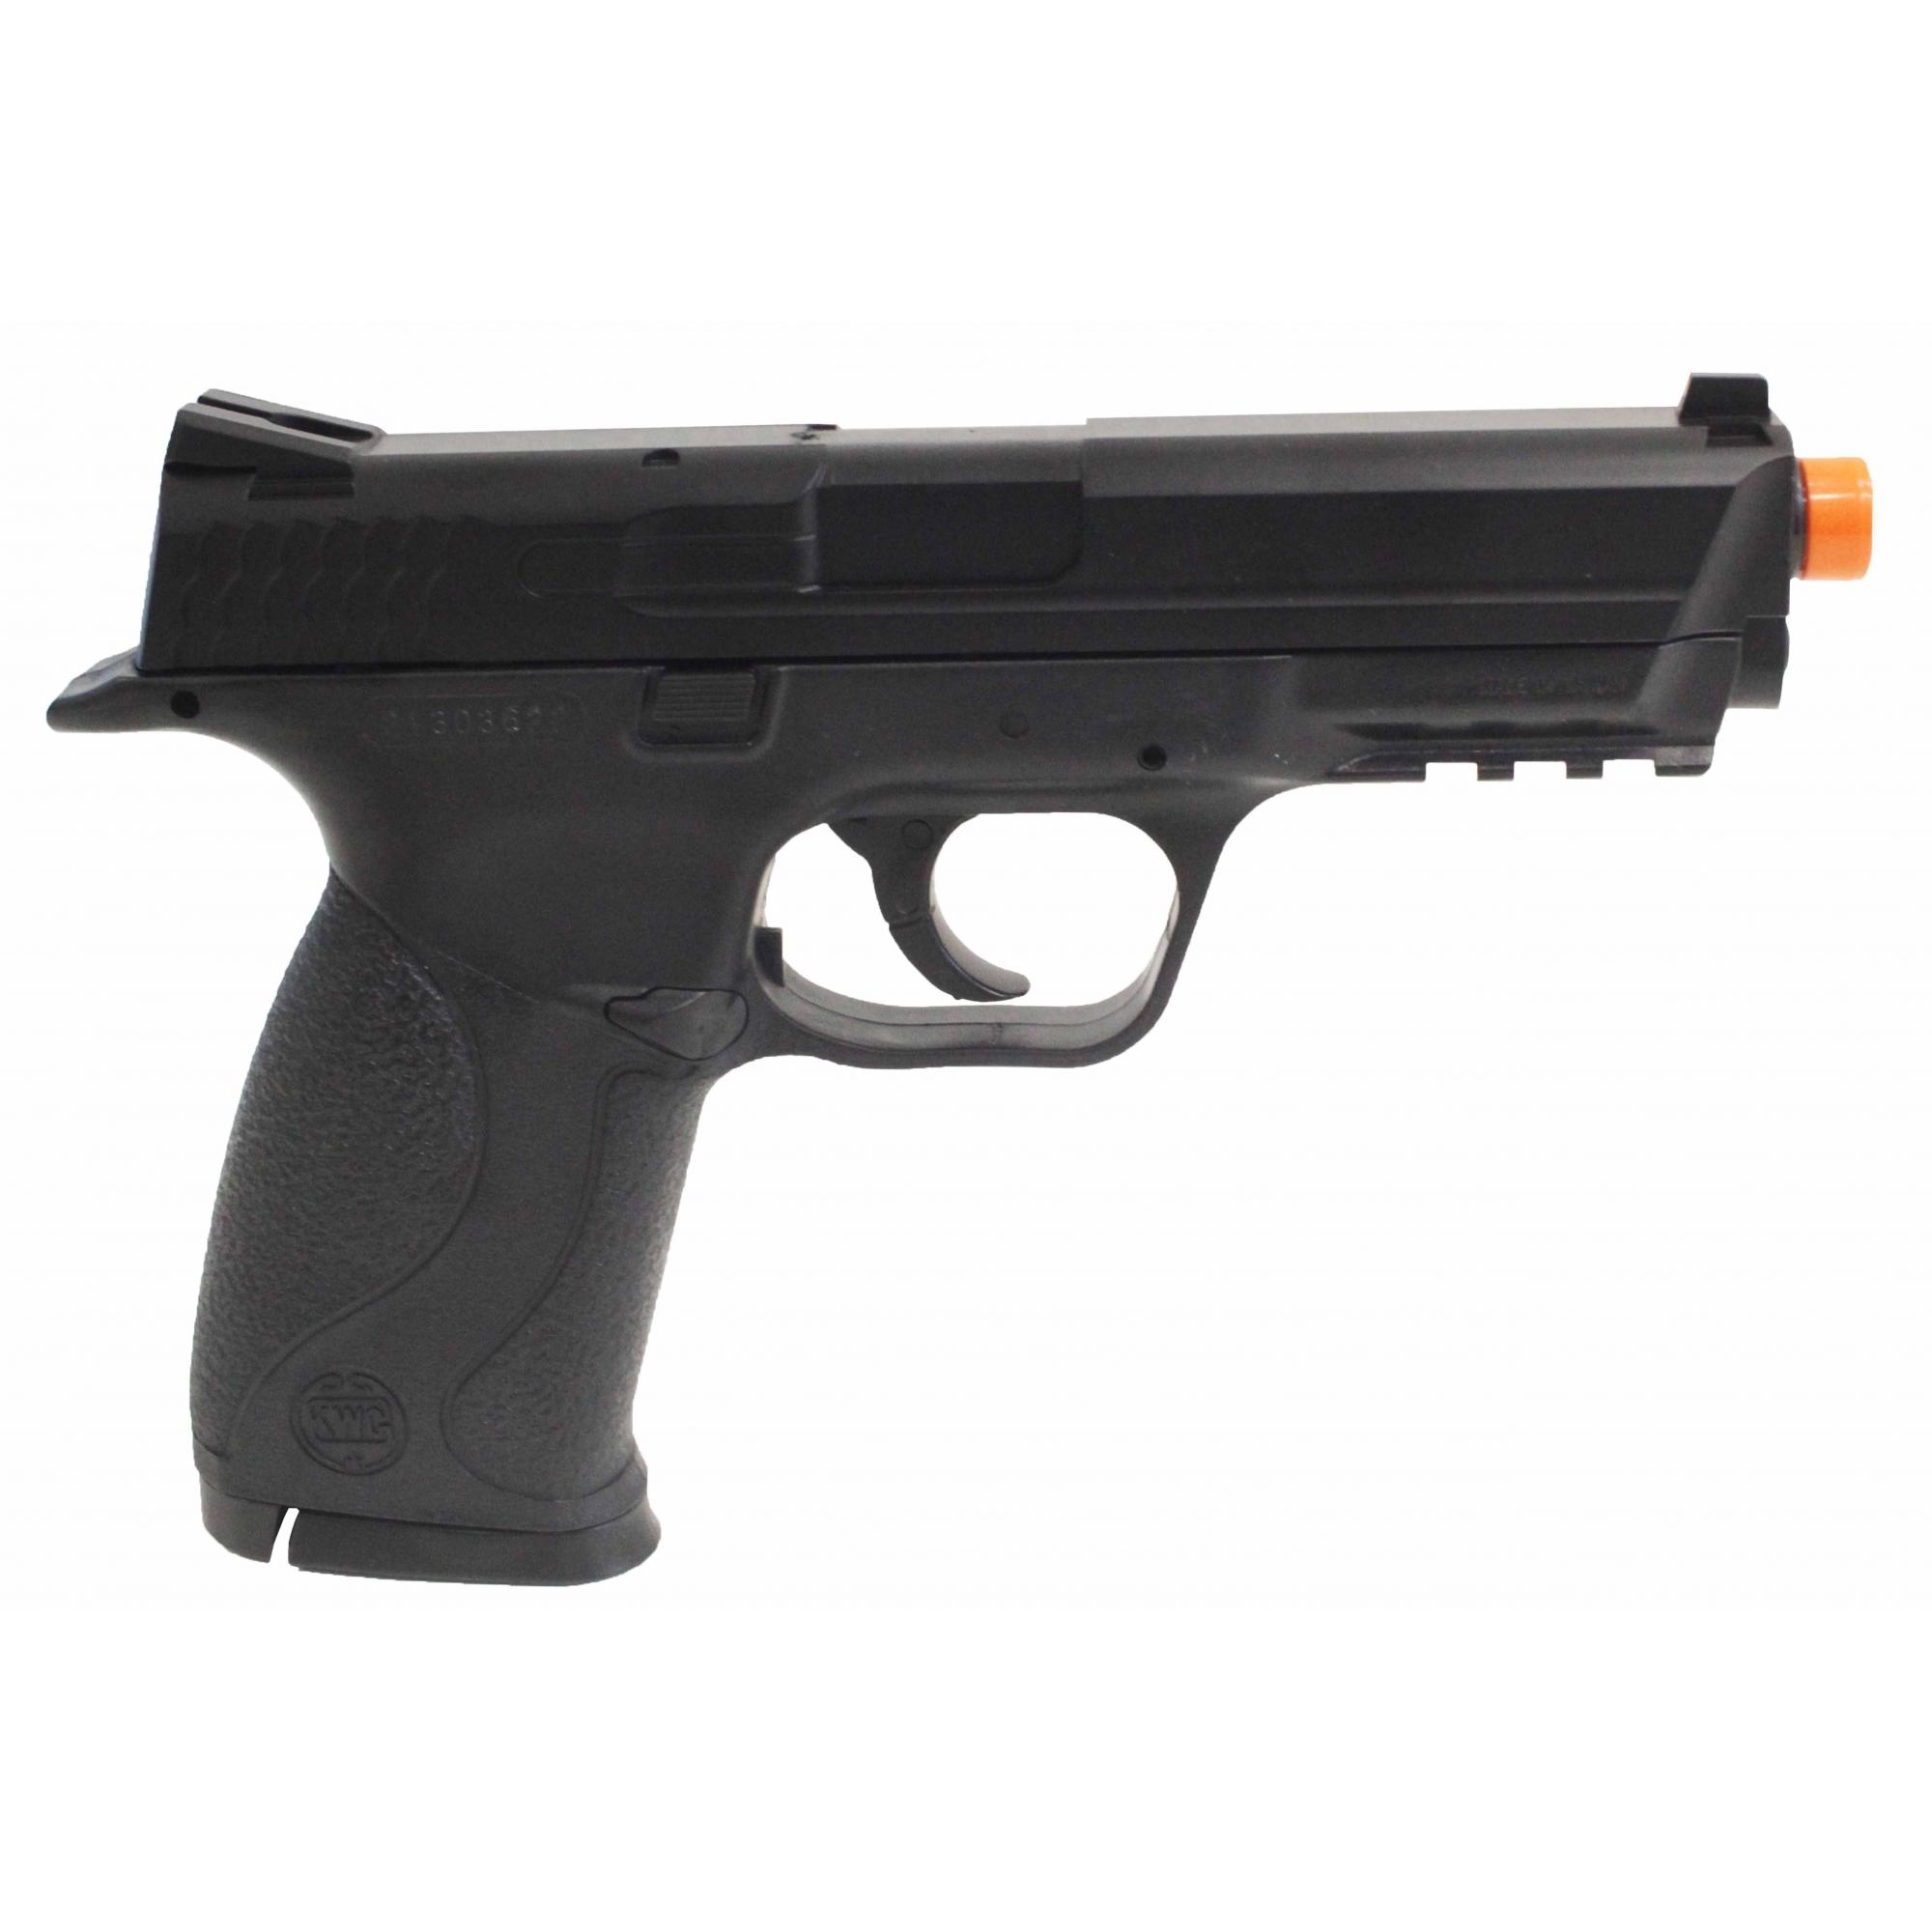 Pistola MP40 Airsoft SEW Co2